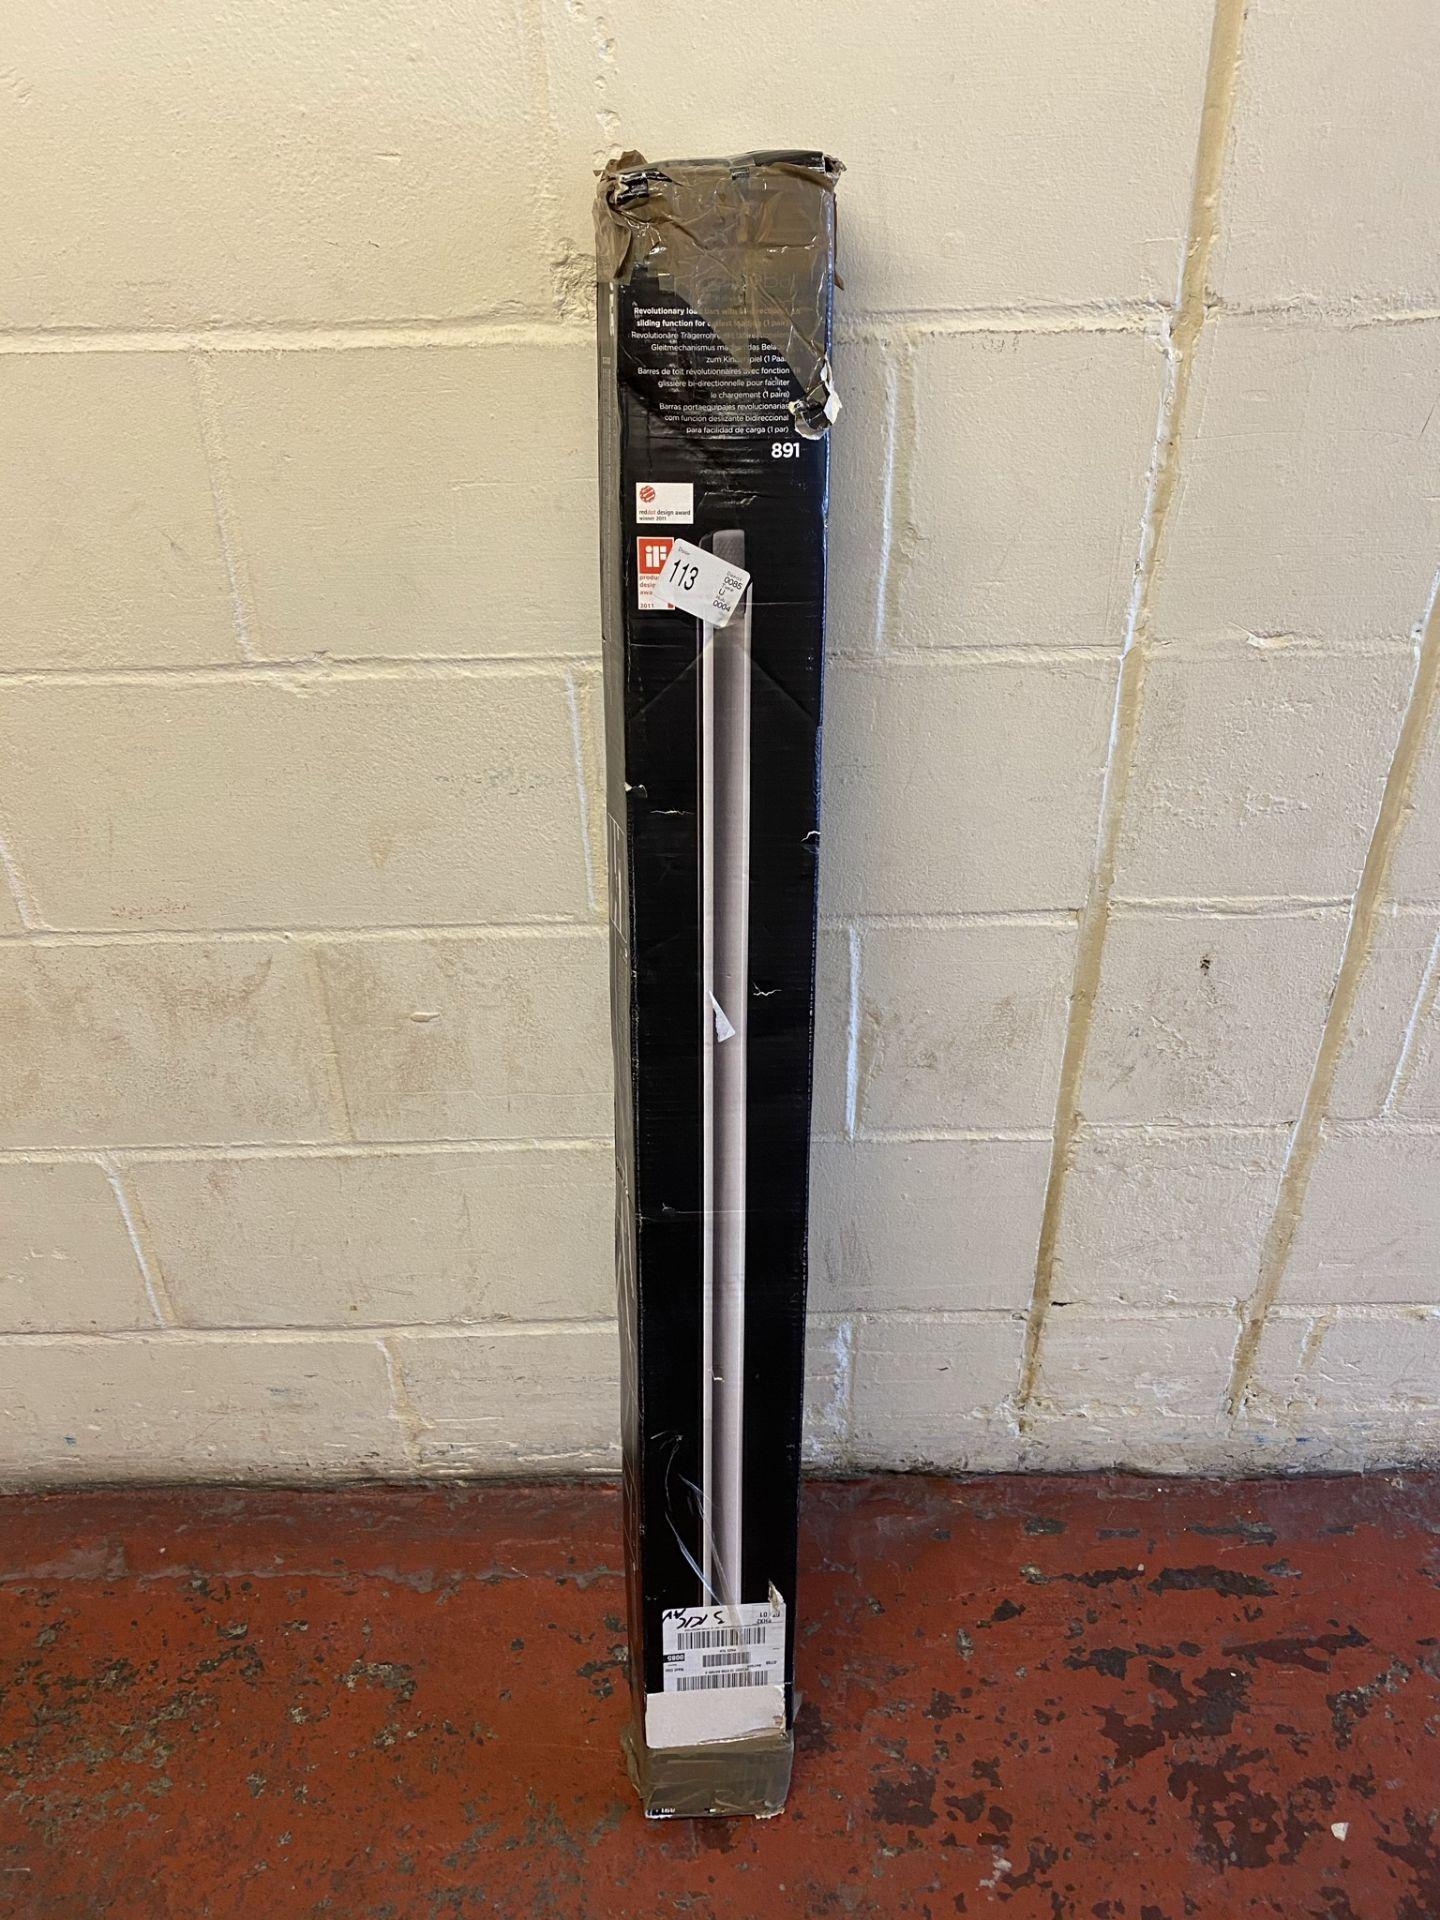 Thule 891 Slide Bars RRP £205